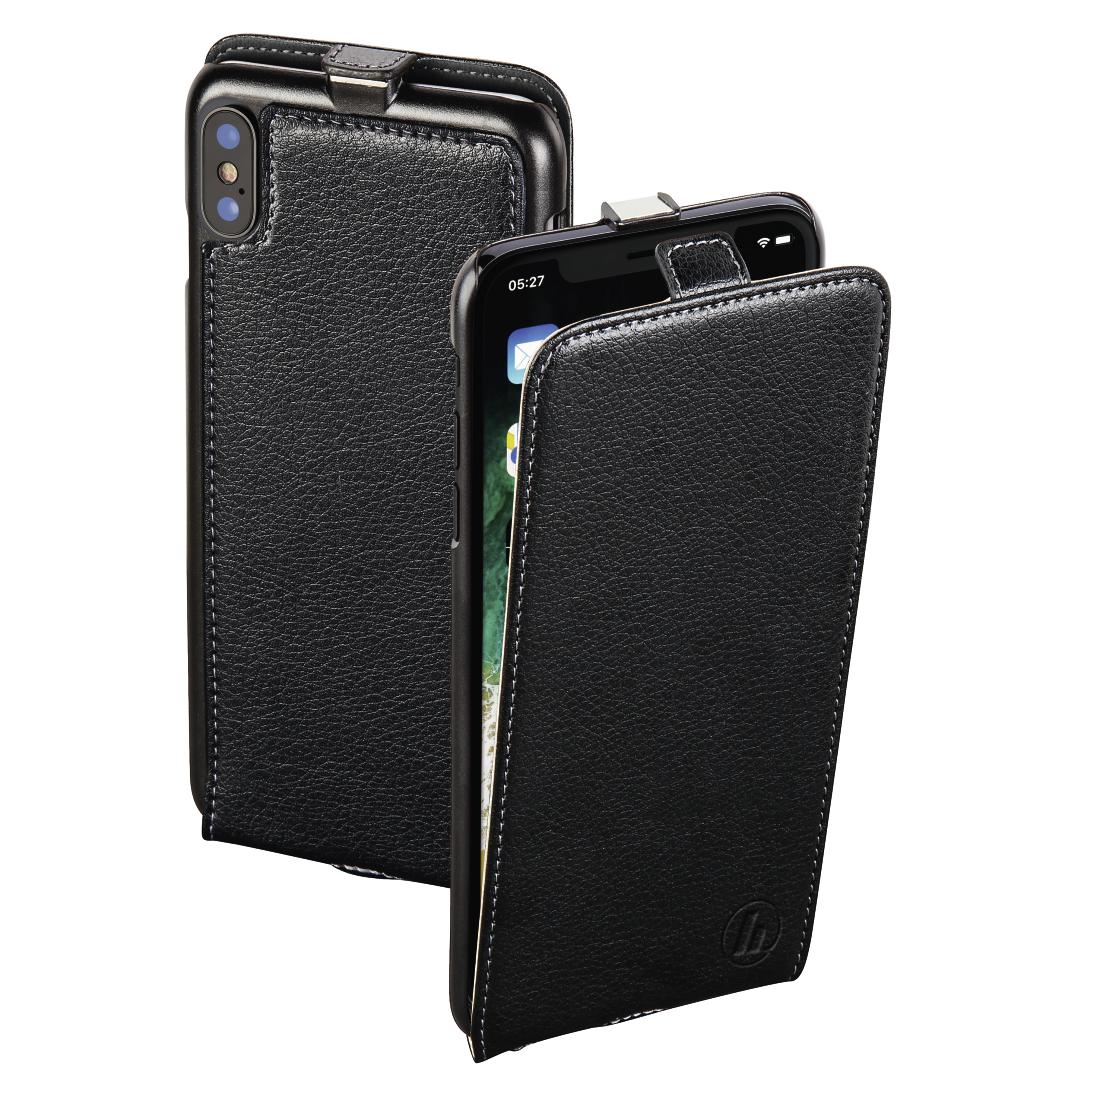 00181385 hama flap tasche smart case f r apple iphone x. Black Bedroom Furniture Sets. Home Design Ideas